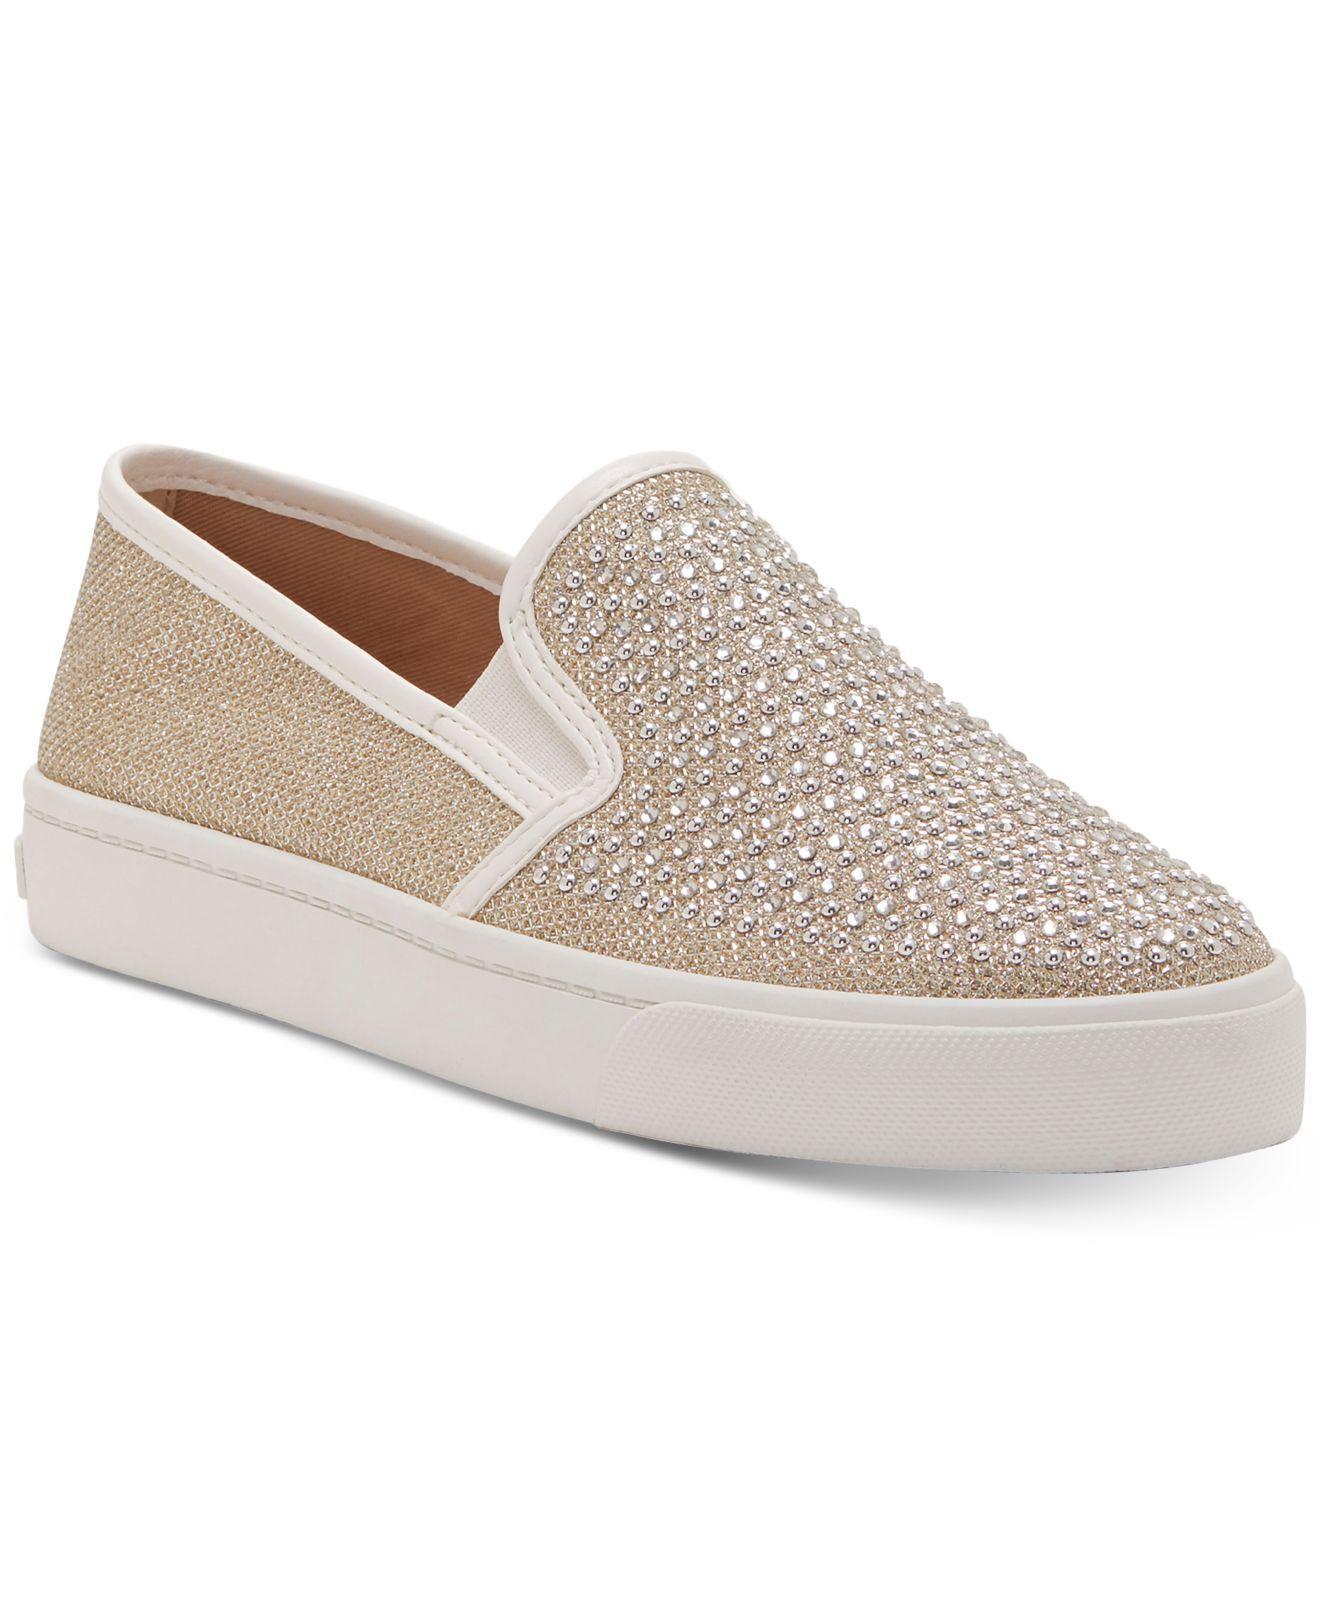 f71358f413f INC International Concepts. Women s Metallic Sammee Slip-on Sneakers